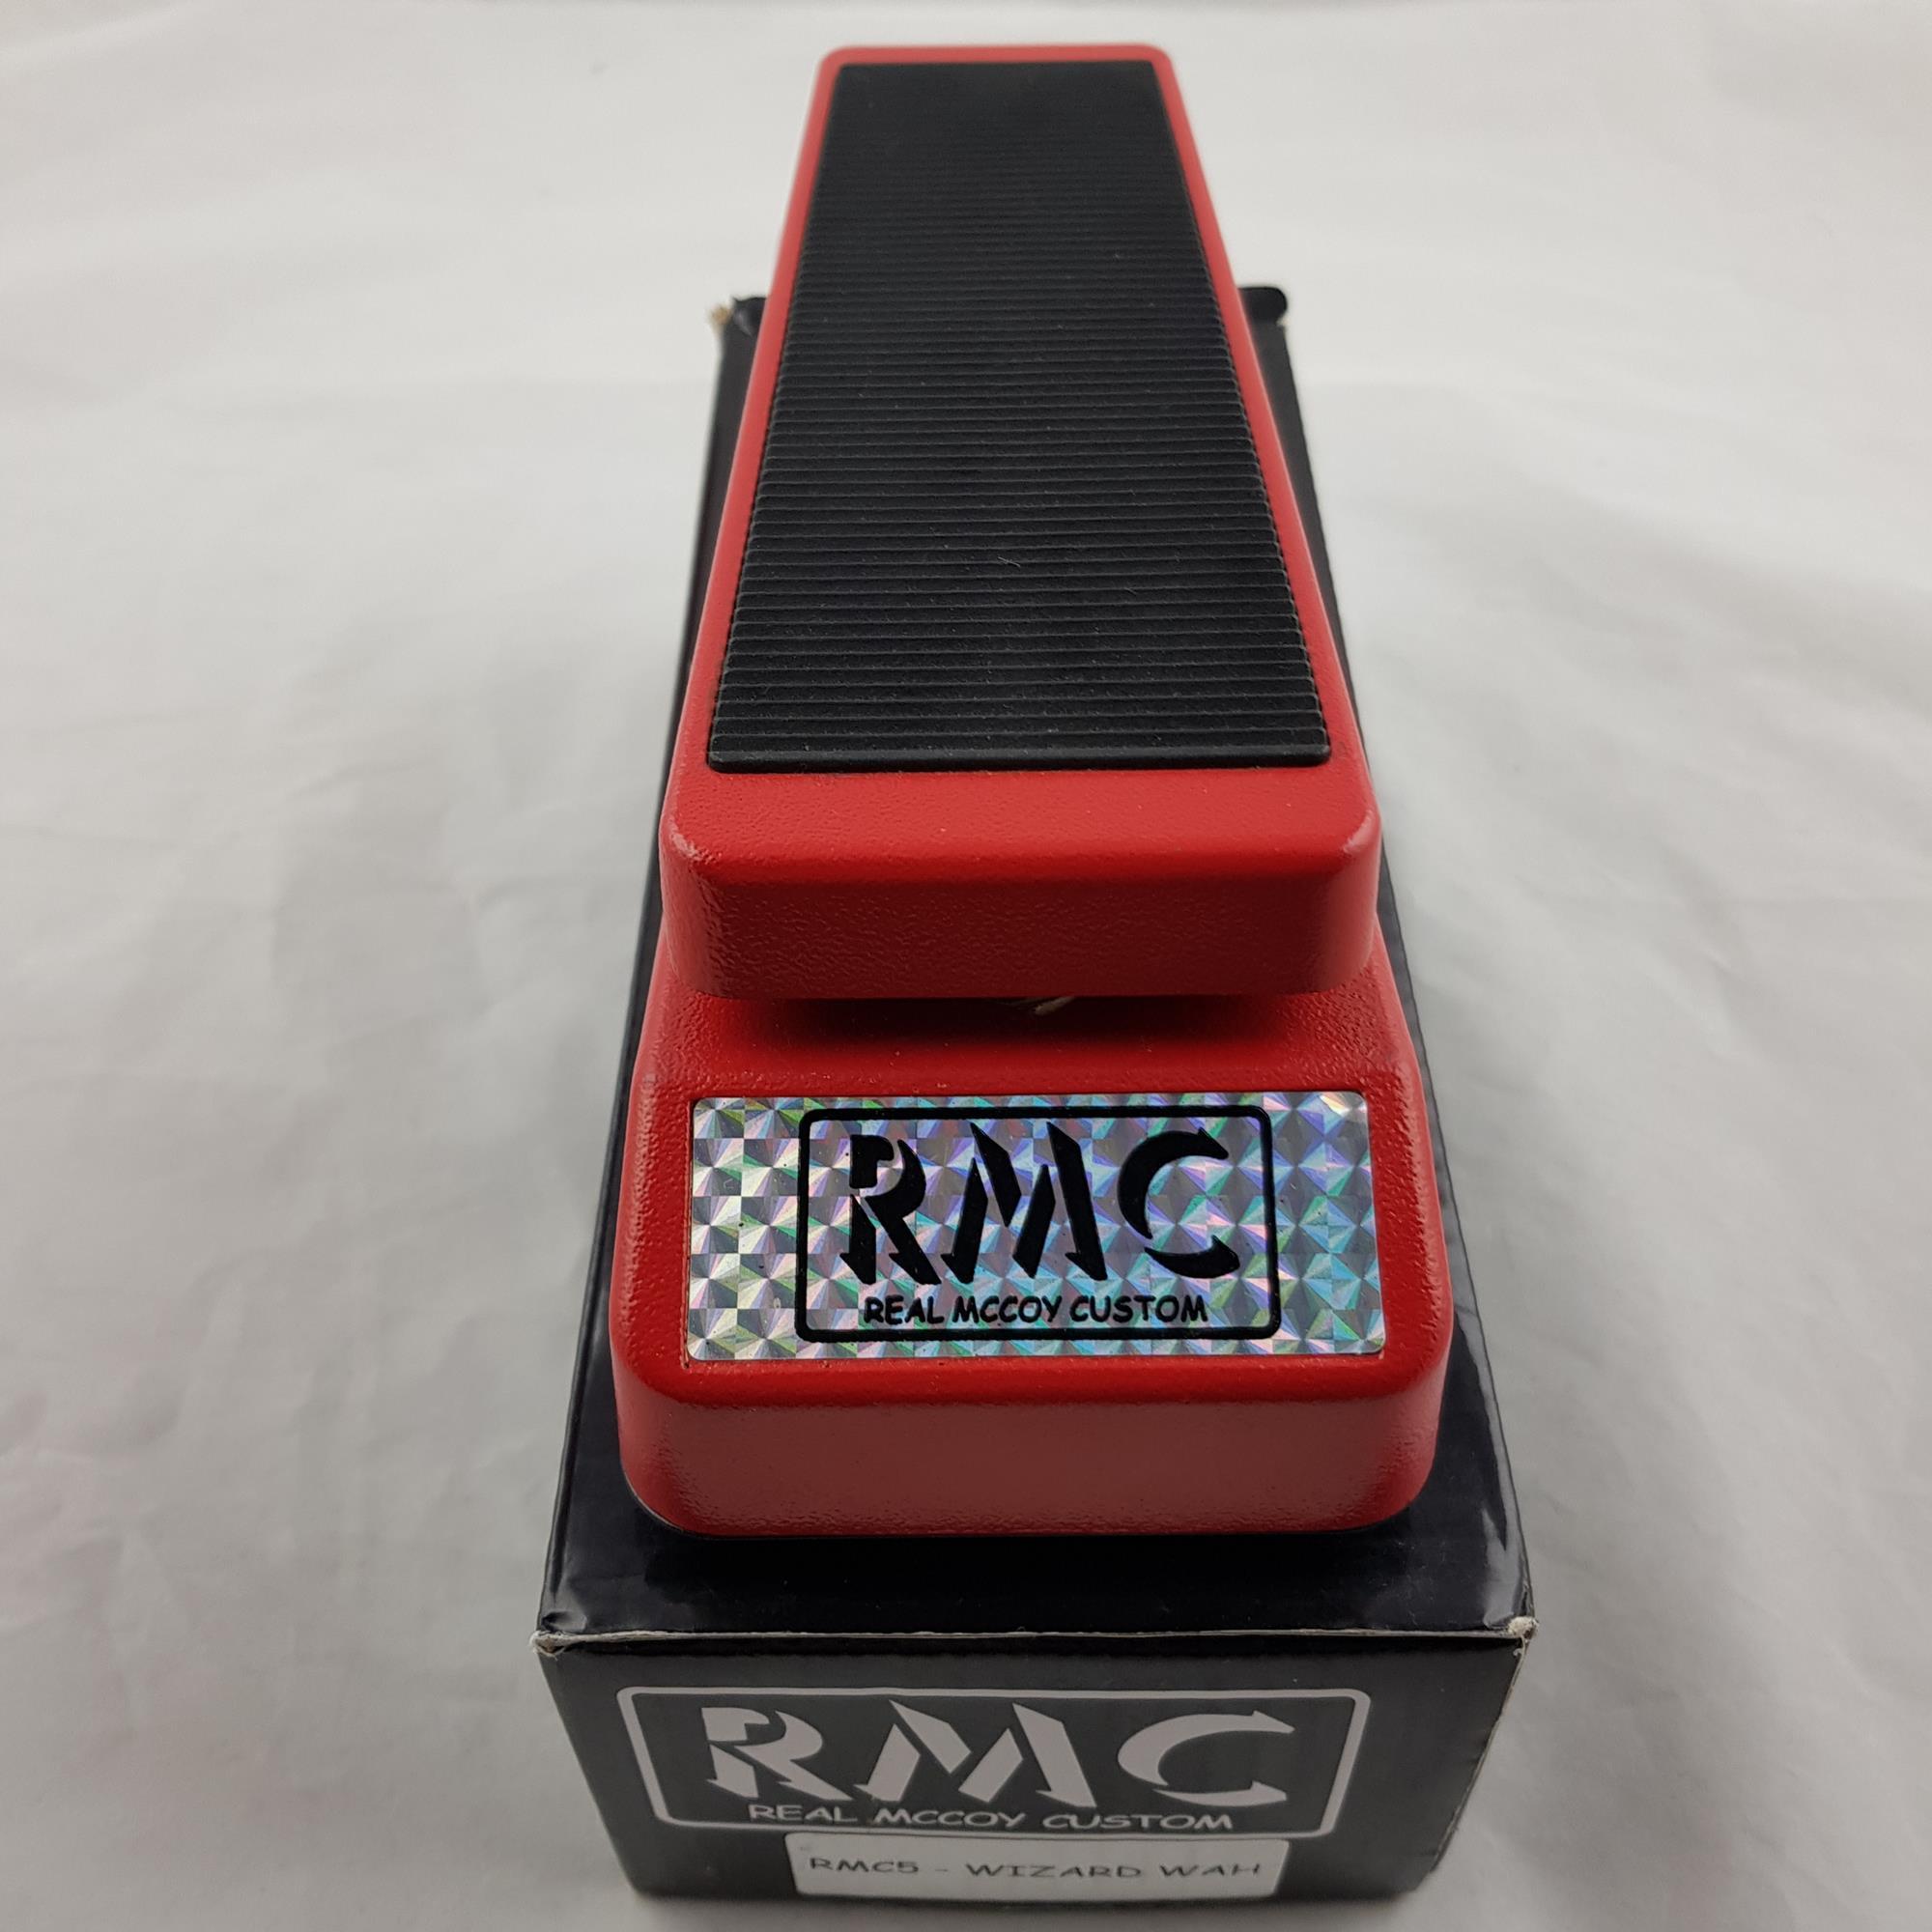 RMC-REAL-MCCOY-CUSTOM-RMC5-WIZARD-WAH-WHA-sku-1612015608215